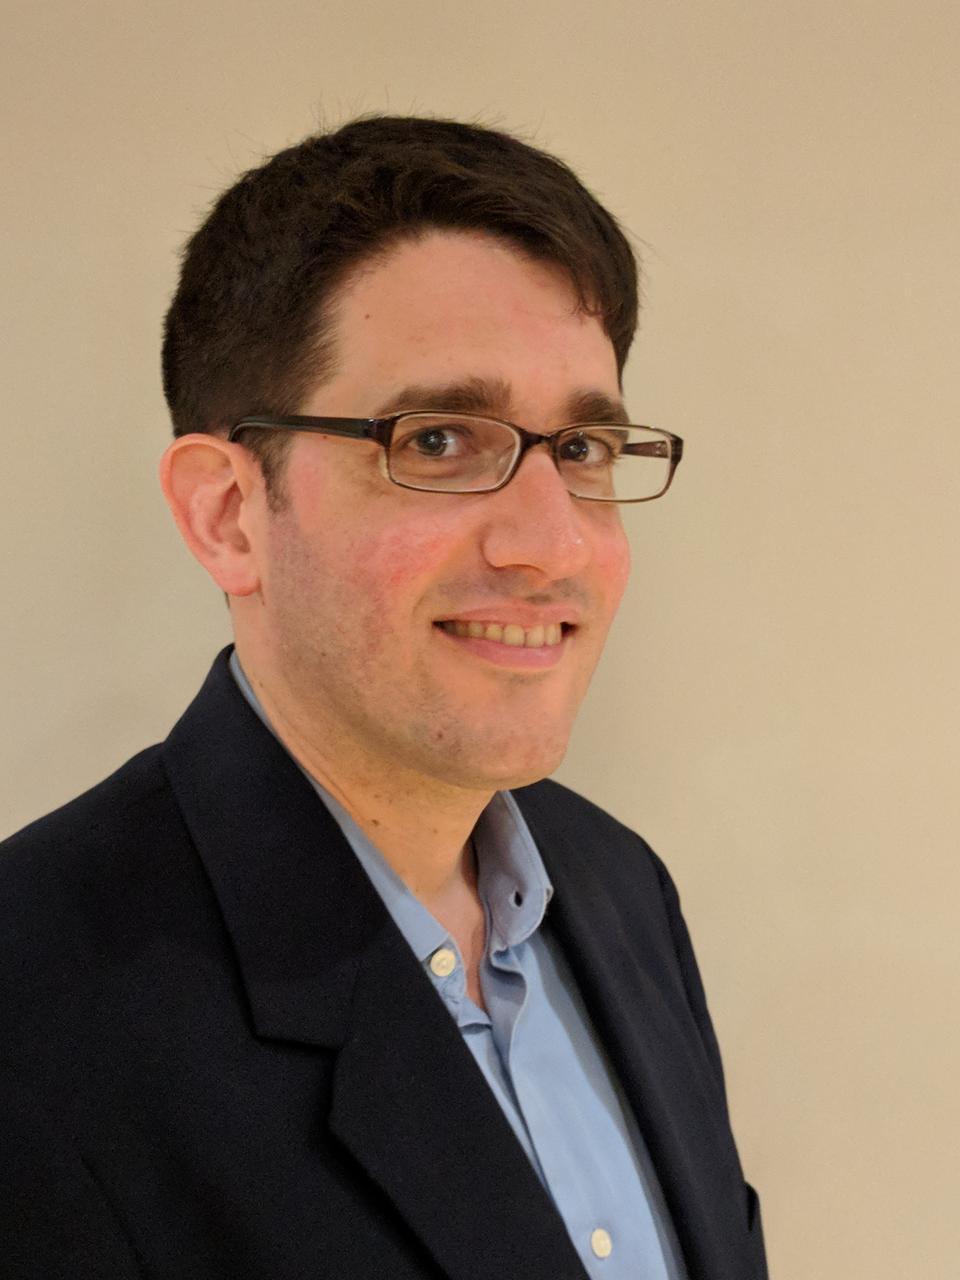 Alex Measure, Economist at Bureau of Labor Statistics